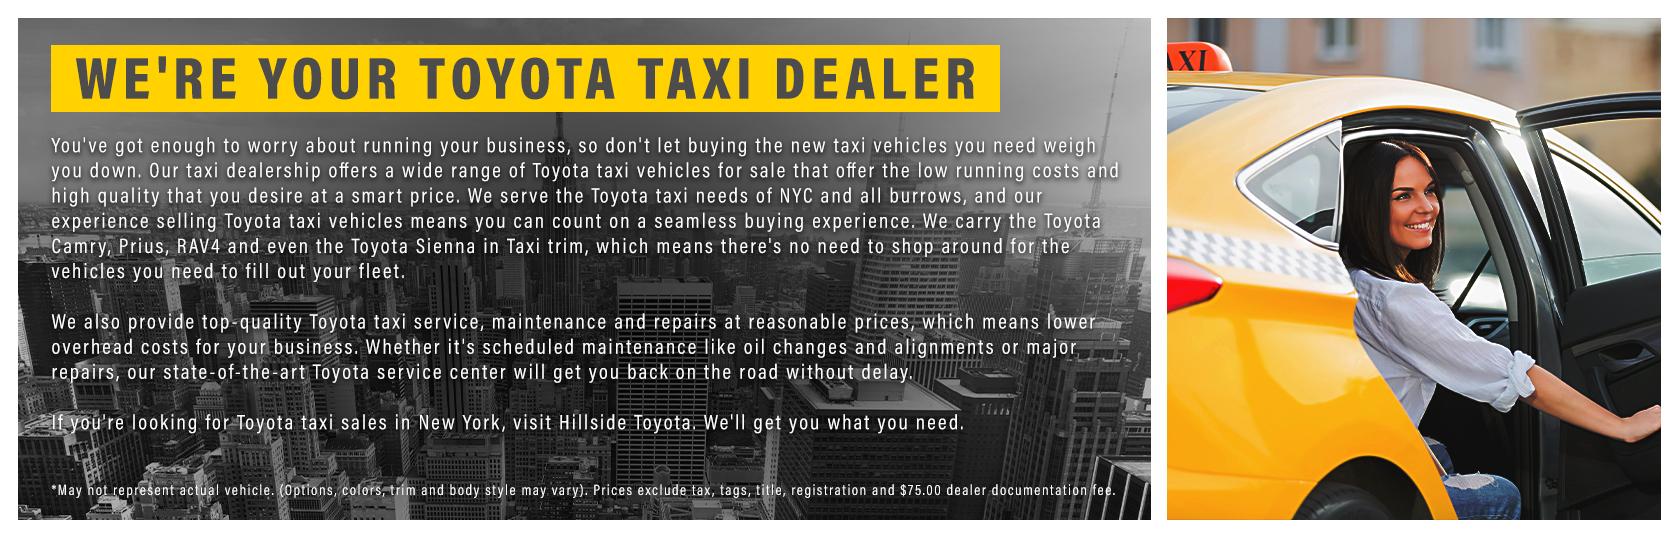 Toyota Taxi Fleet